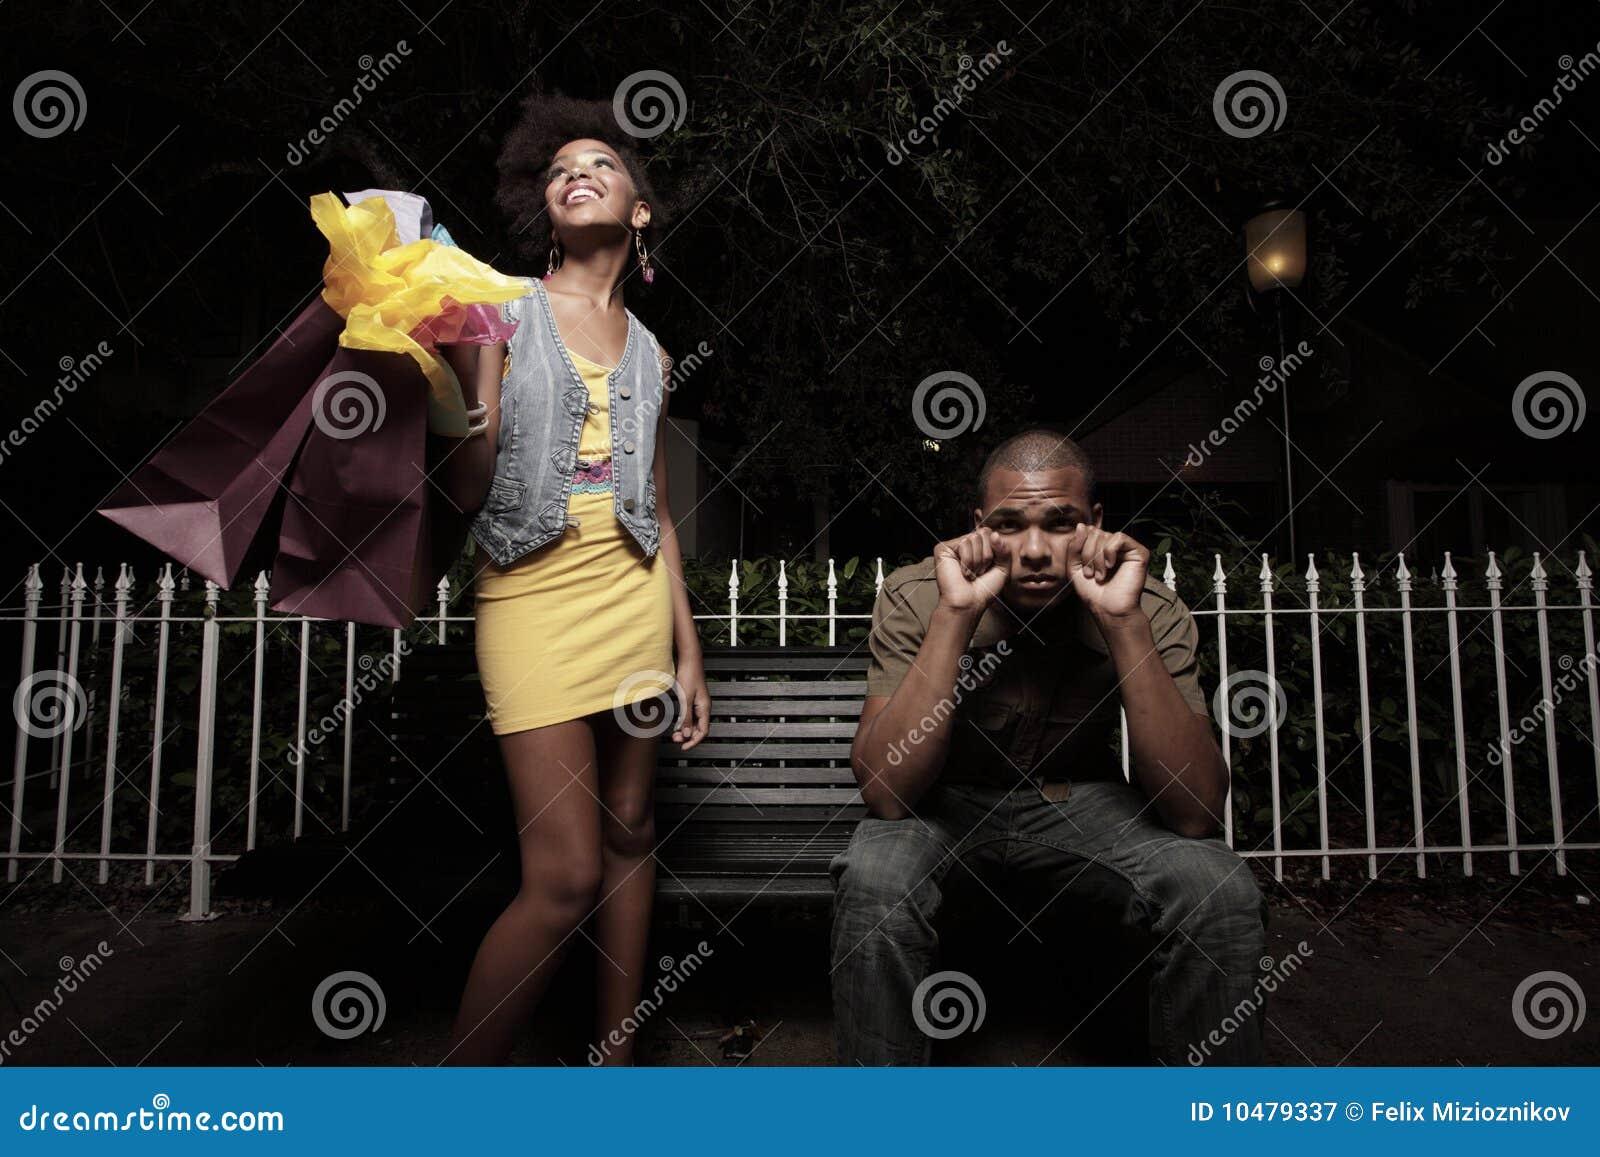 Download Girl spending boy's money stock image. Image of nighttime - 10479337